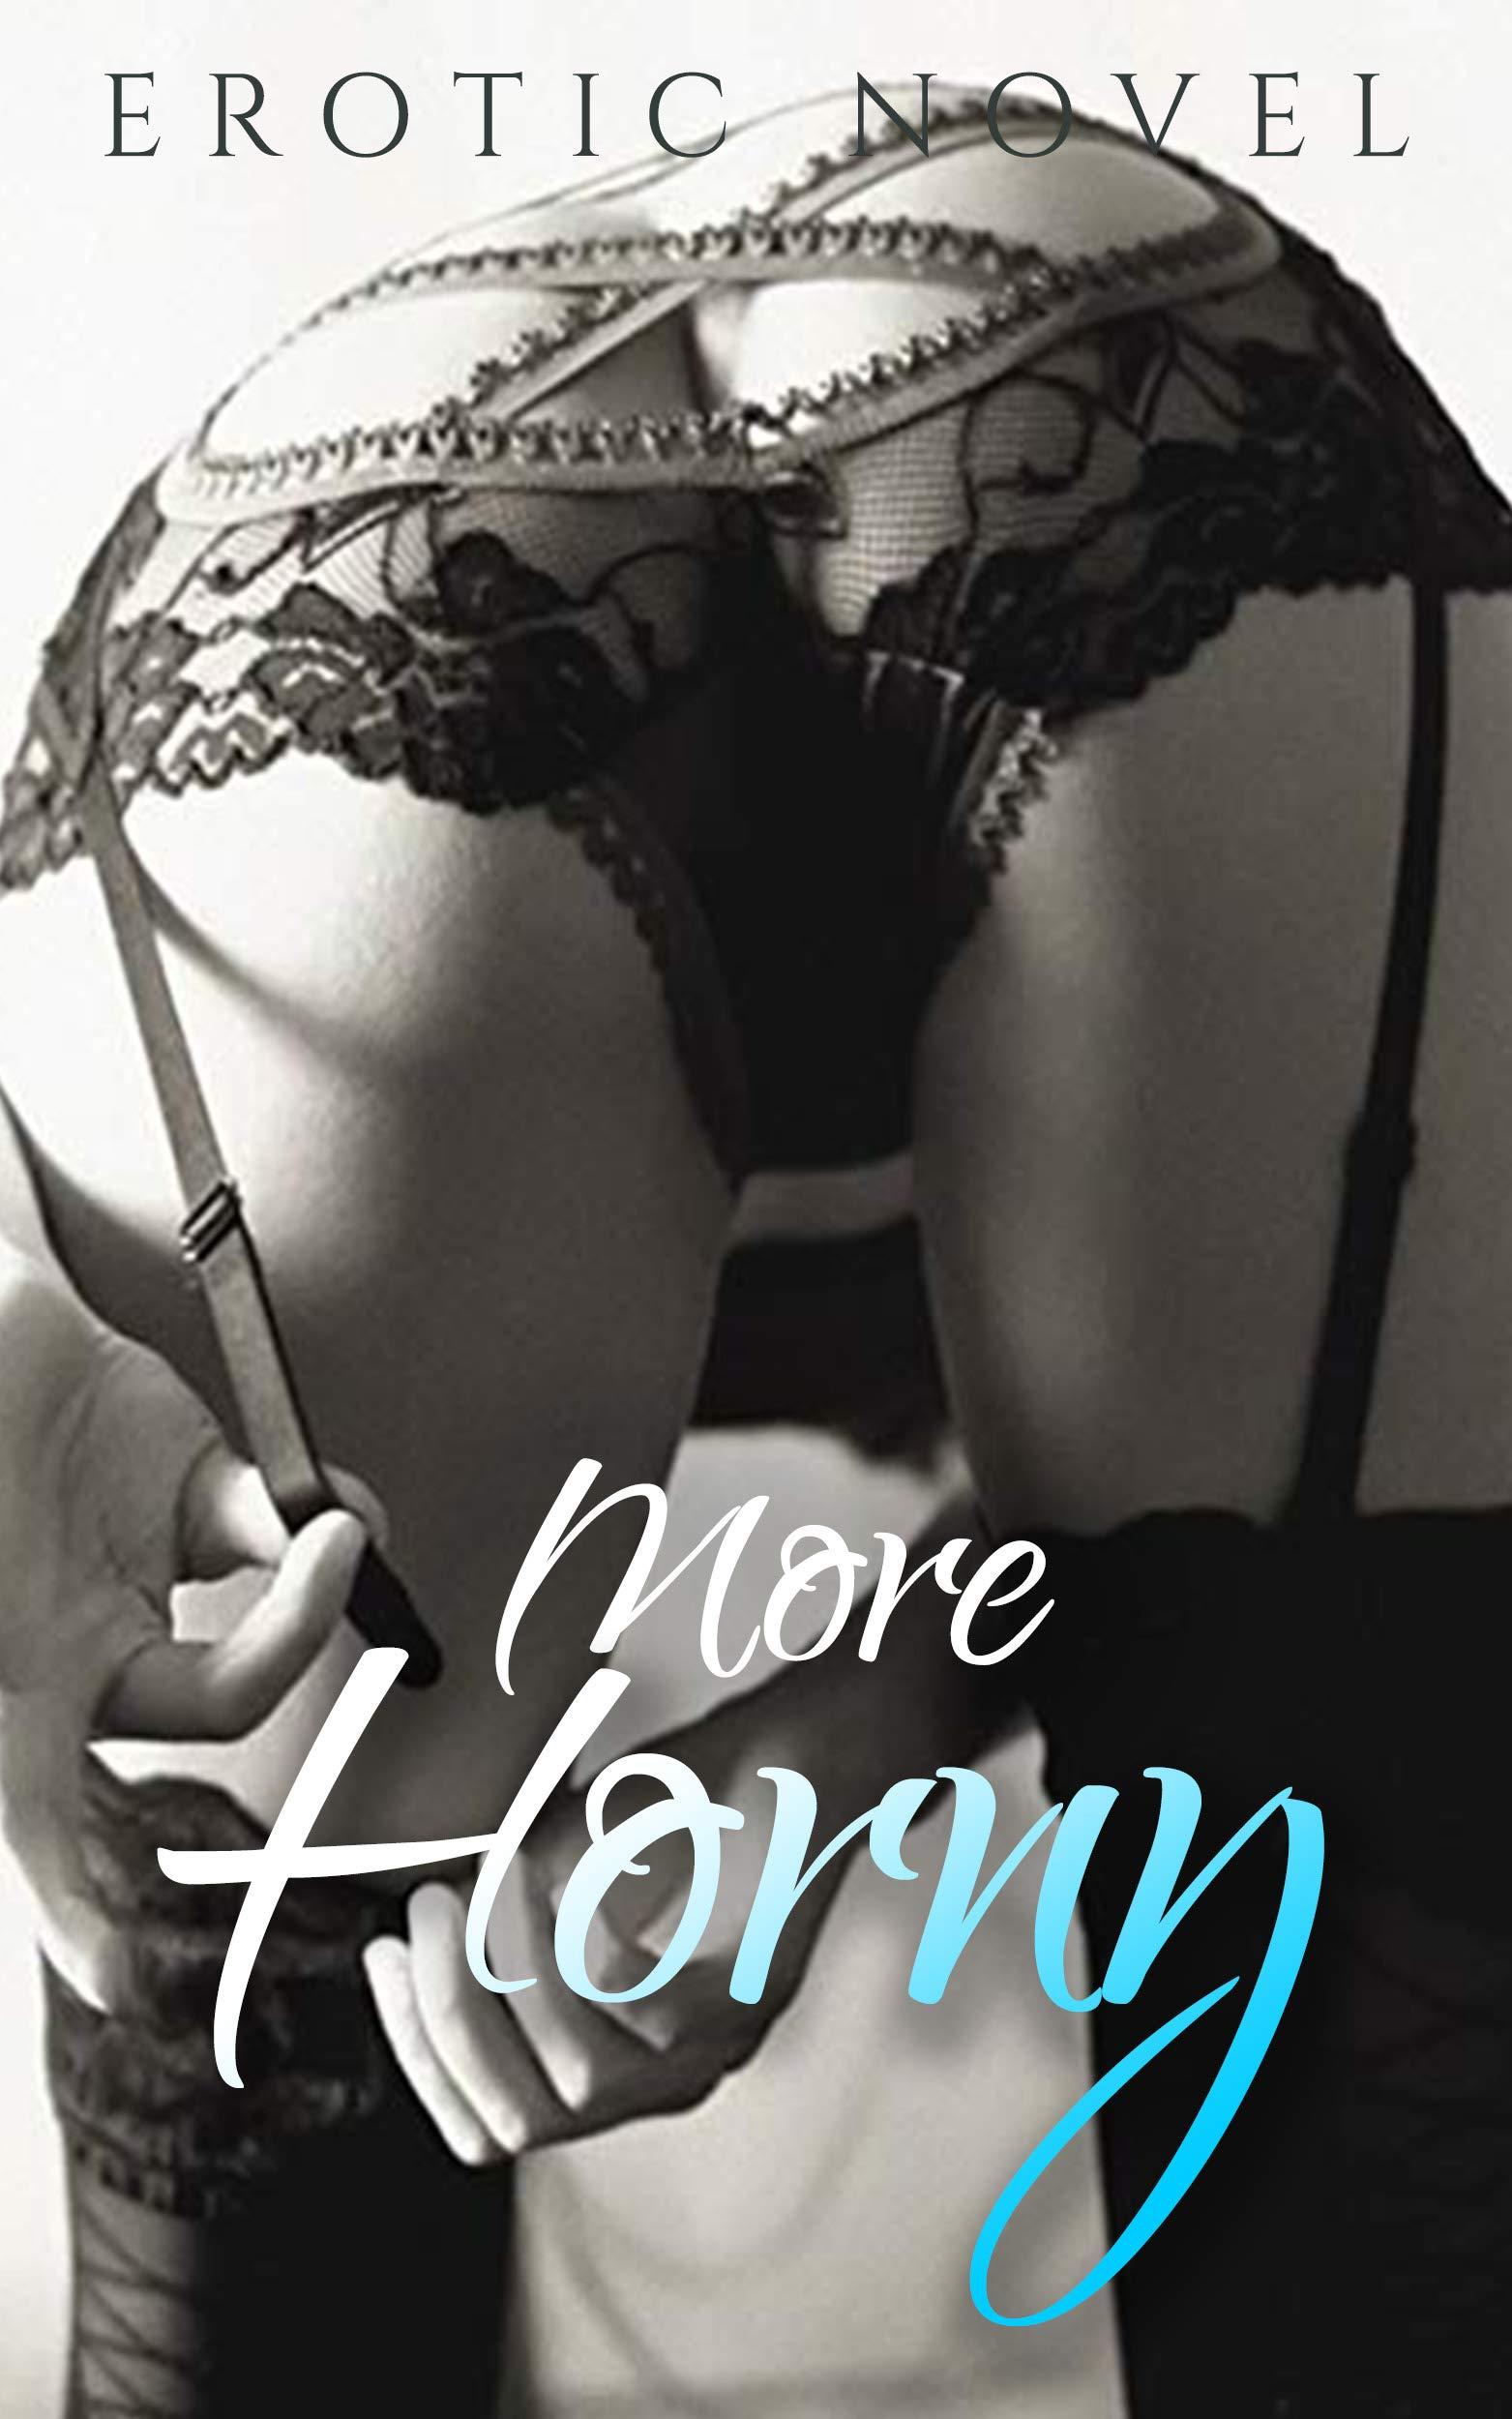 More Horny: Erotic Novel